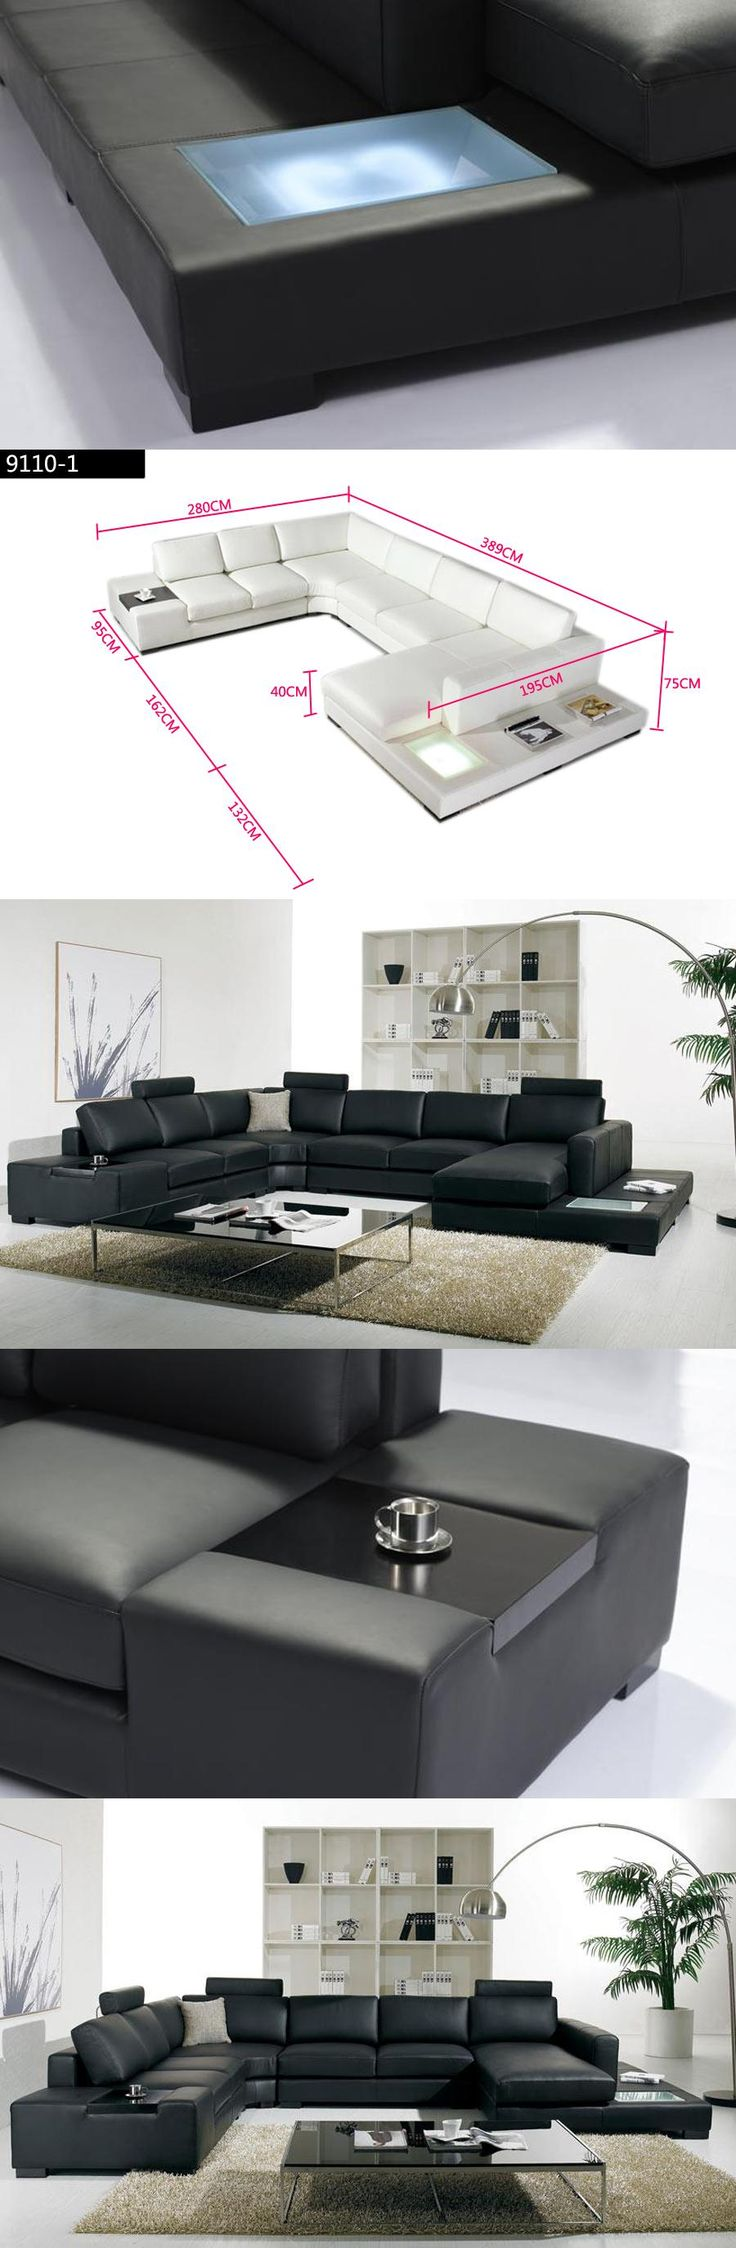 Best 25+ Black sofa set ideas on Pinterest | Black sofa, Black ...